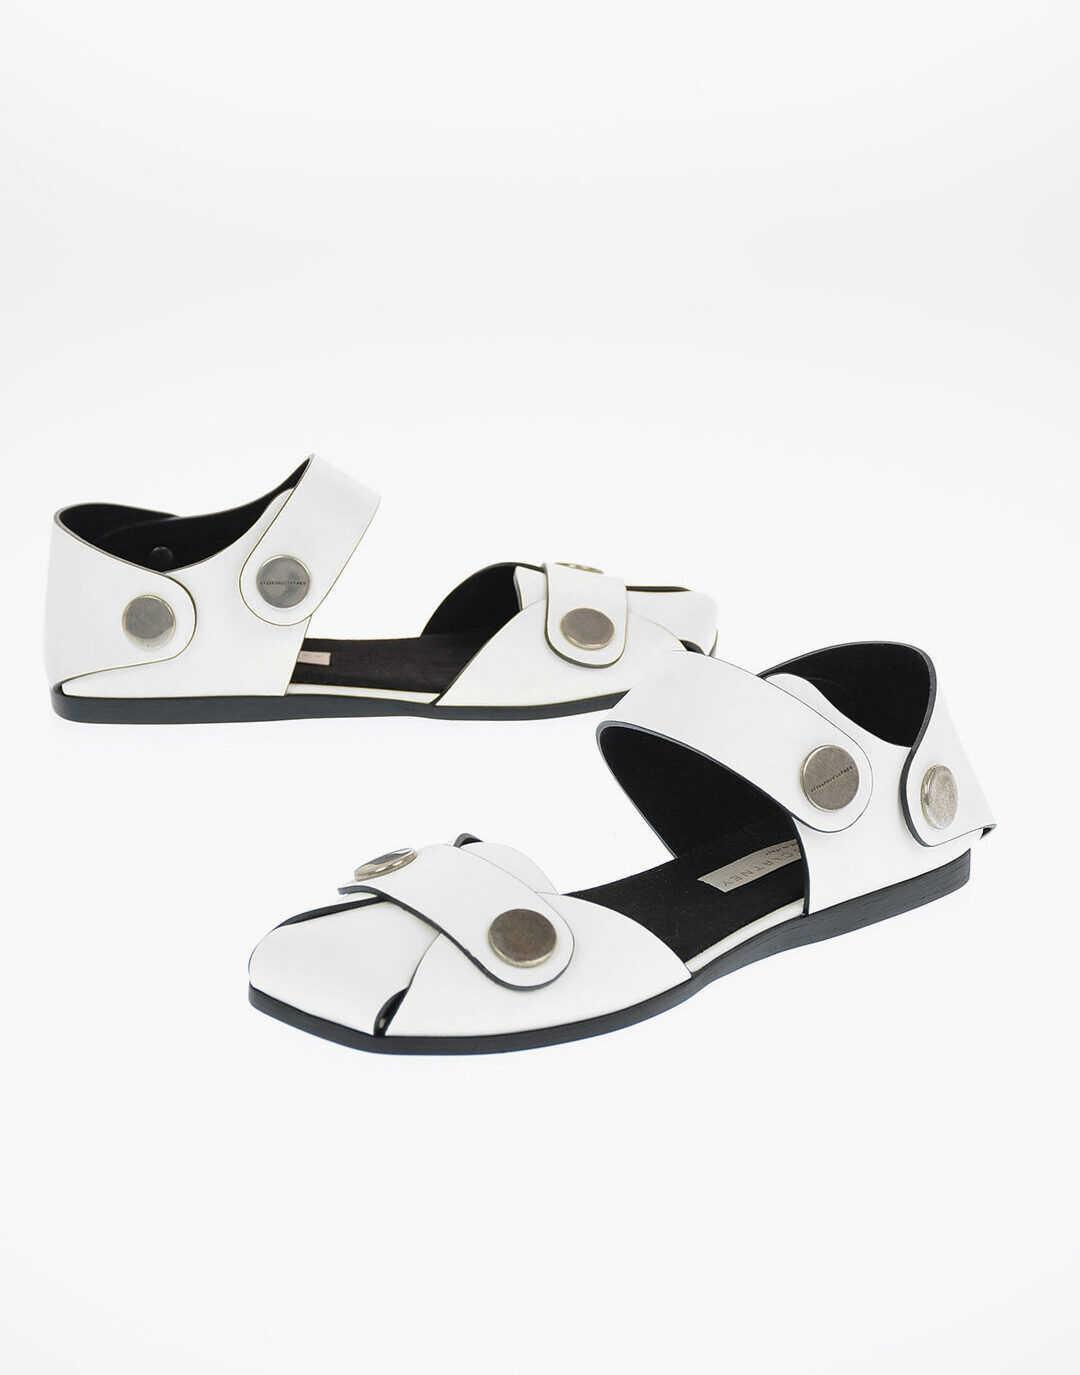 Stella McCartney Faux Leather COWPER Sandals WHITE imagine b-mall.ro